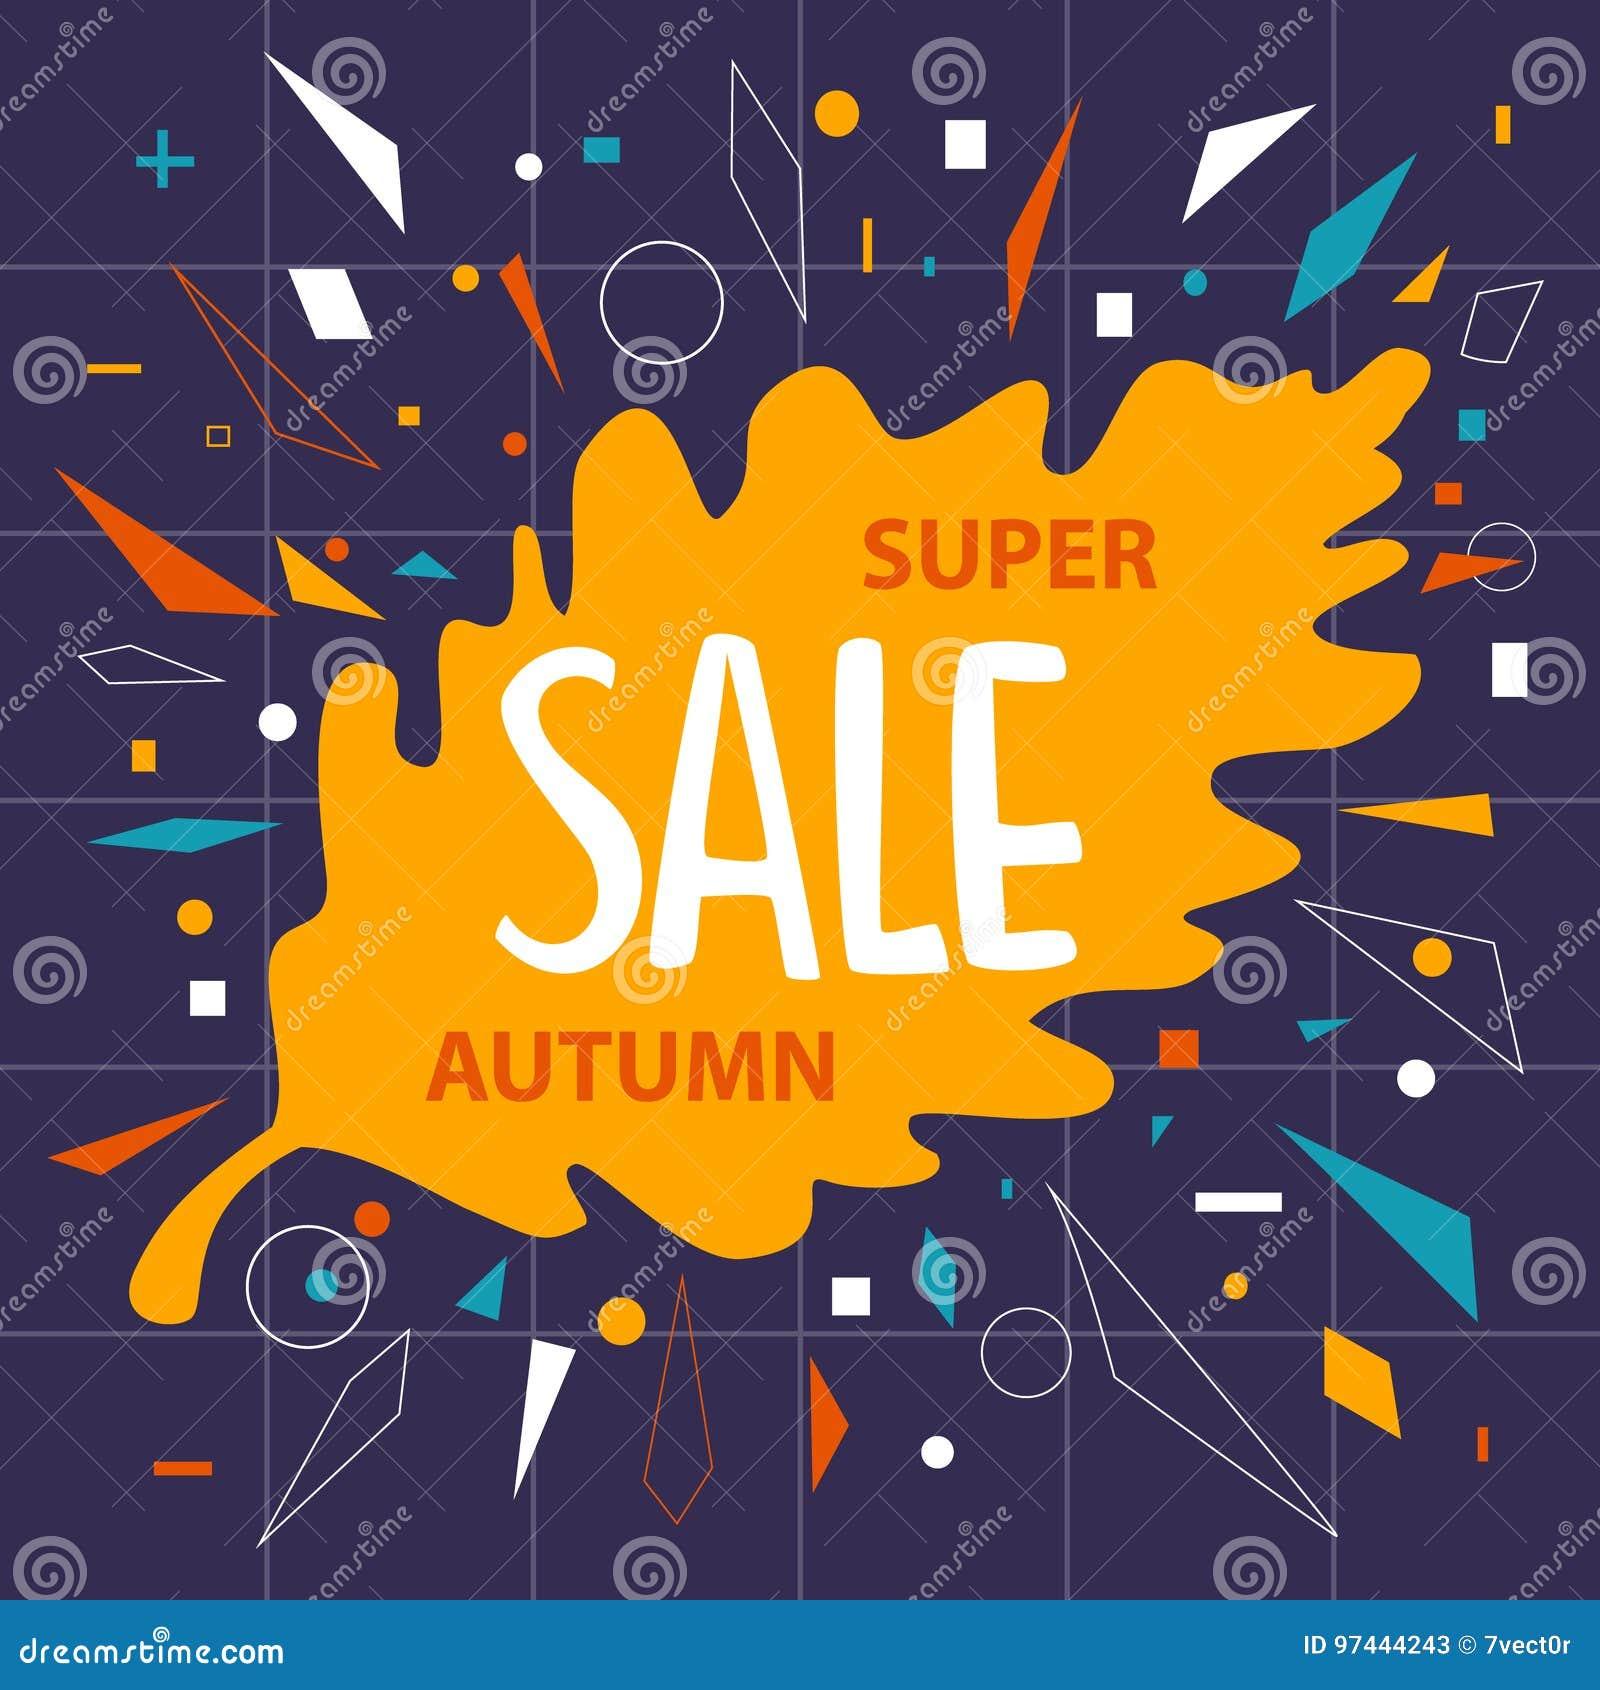 Autumn fall oak leaf sale banner background with geometric confetti shapes